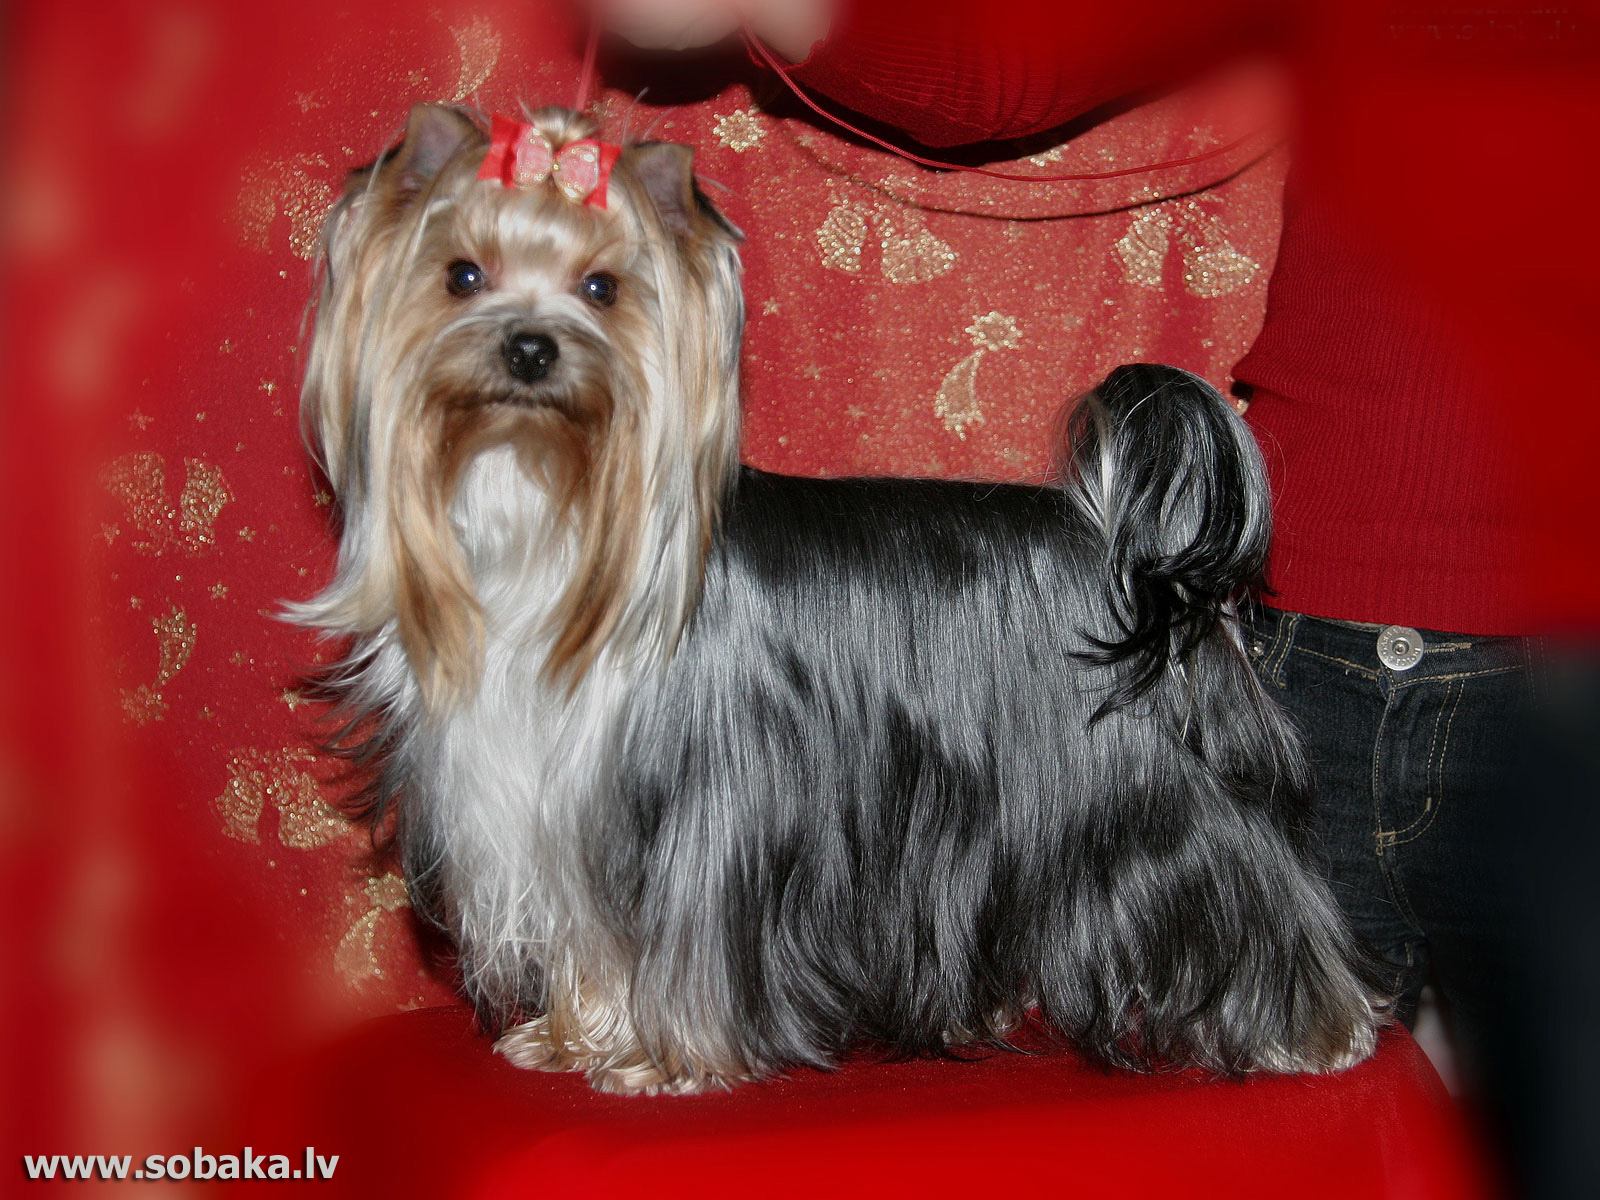 Yorkshire,terrier,lying,fabric,face,beautiful,dog,hd,wallpaper,animal,hd animal wallpaper,wallpaperdx animals,full hd